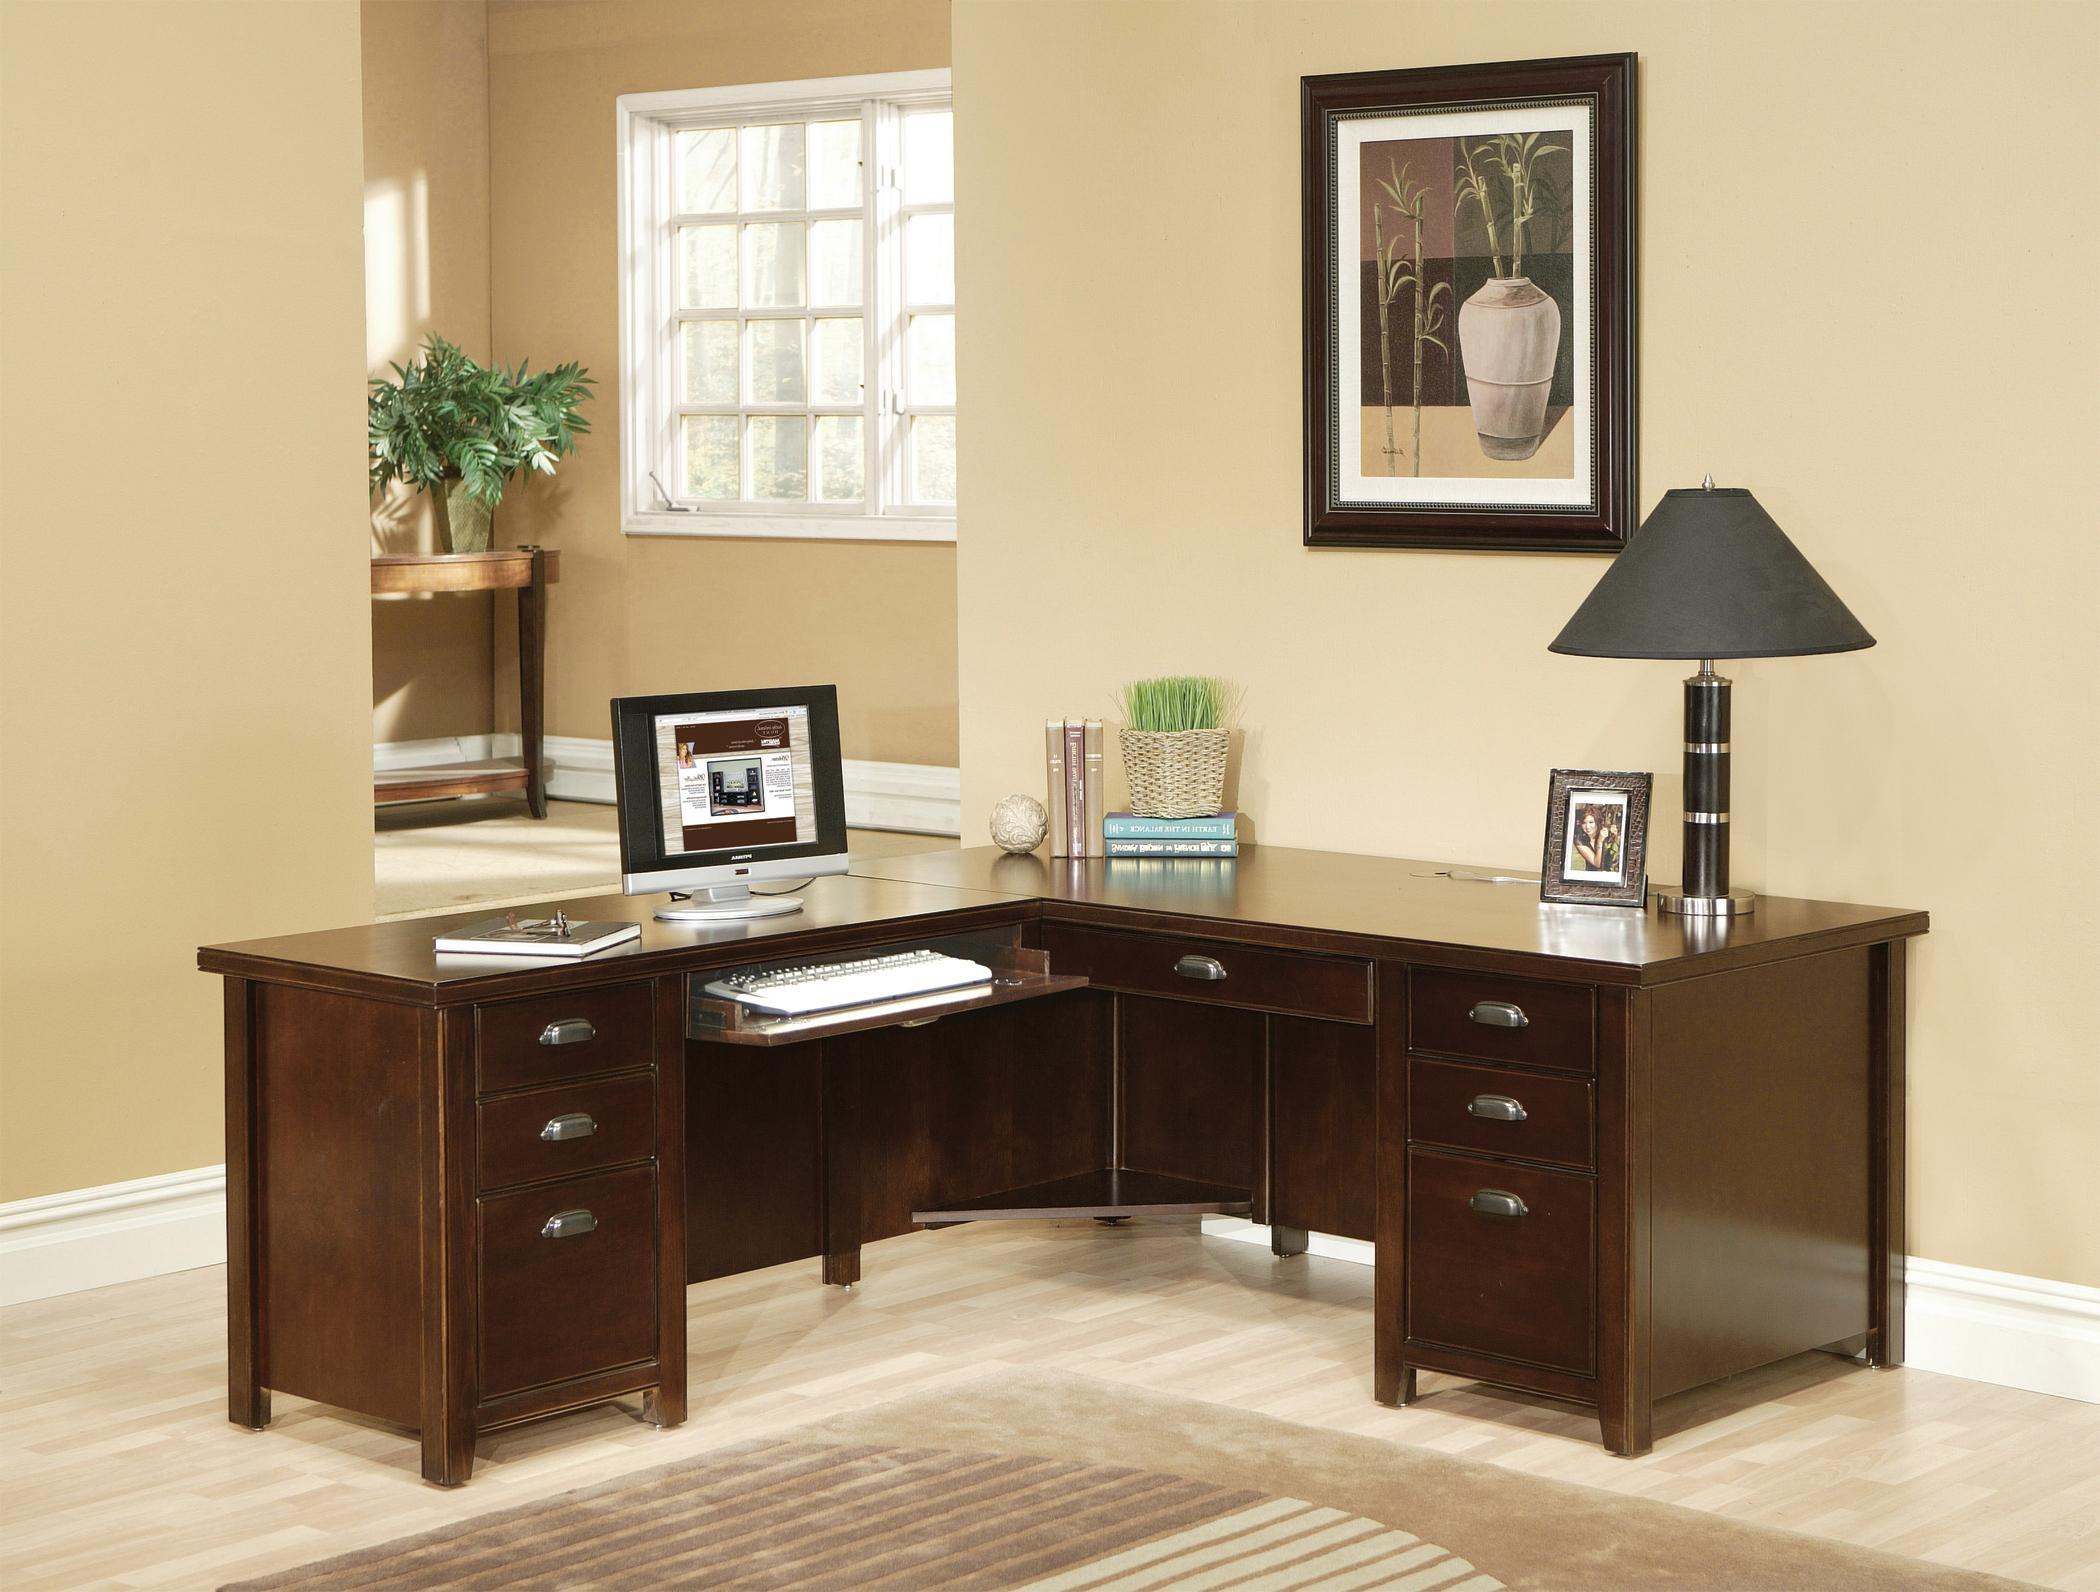 kathy ireland Home by Martin Tribeca Loft L-Shaped Desk with Left Hand Facing Return - Item Number: TLC684L+TLC684L-R